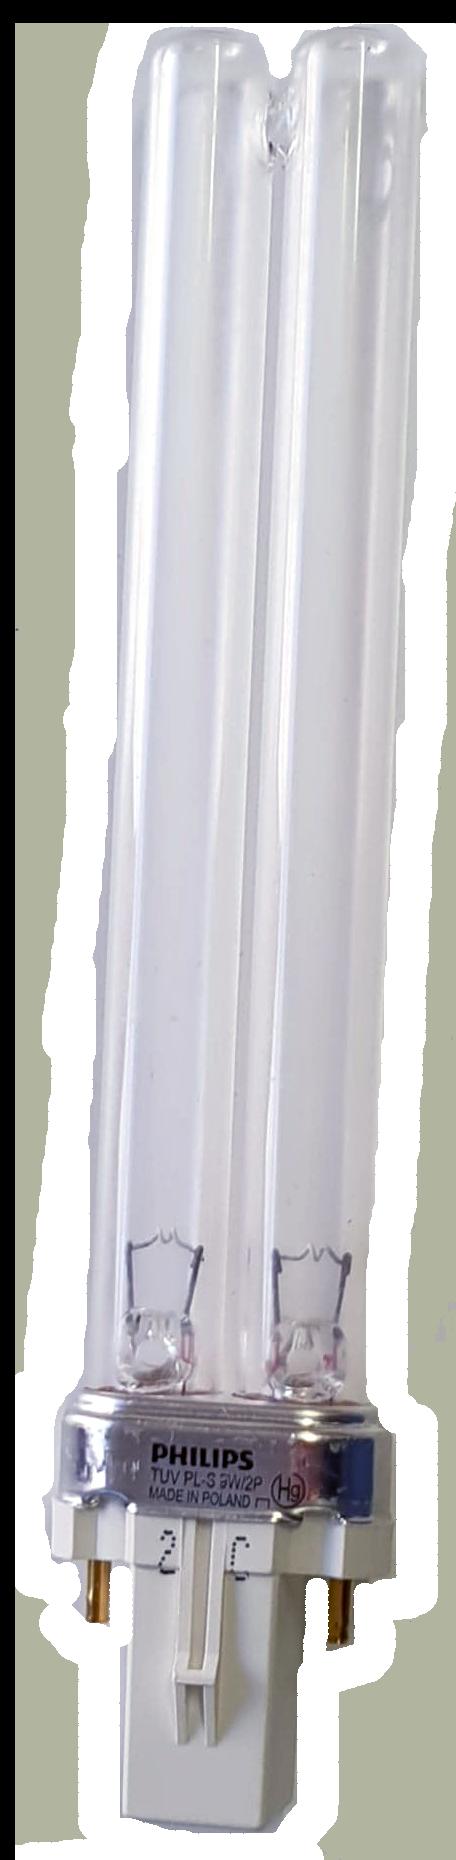 Phillips 9w UV bulb suitable for ultra violet clarifiers